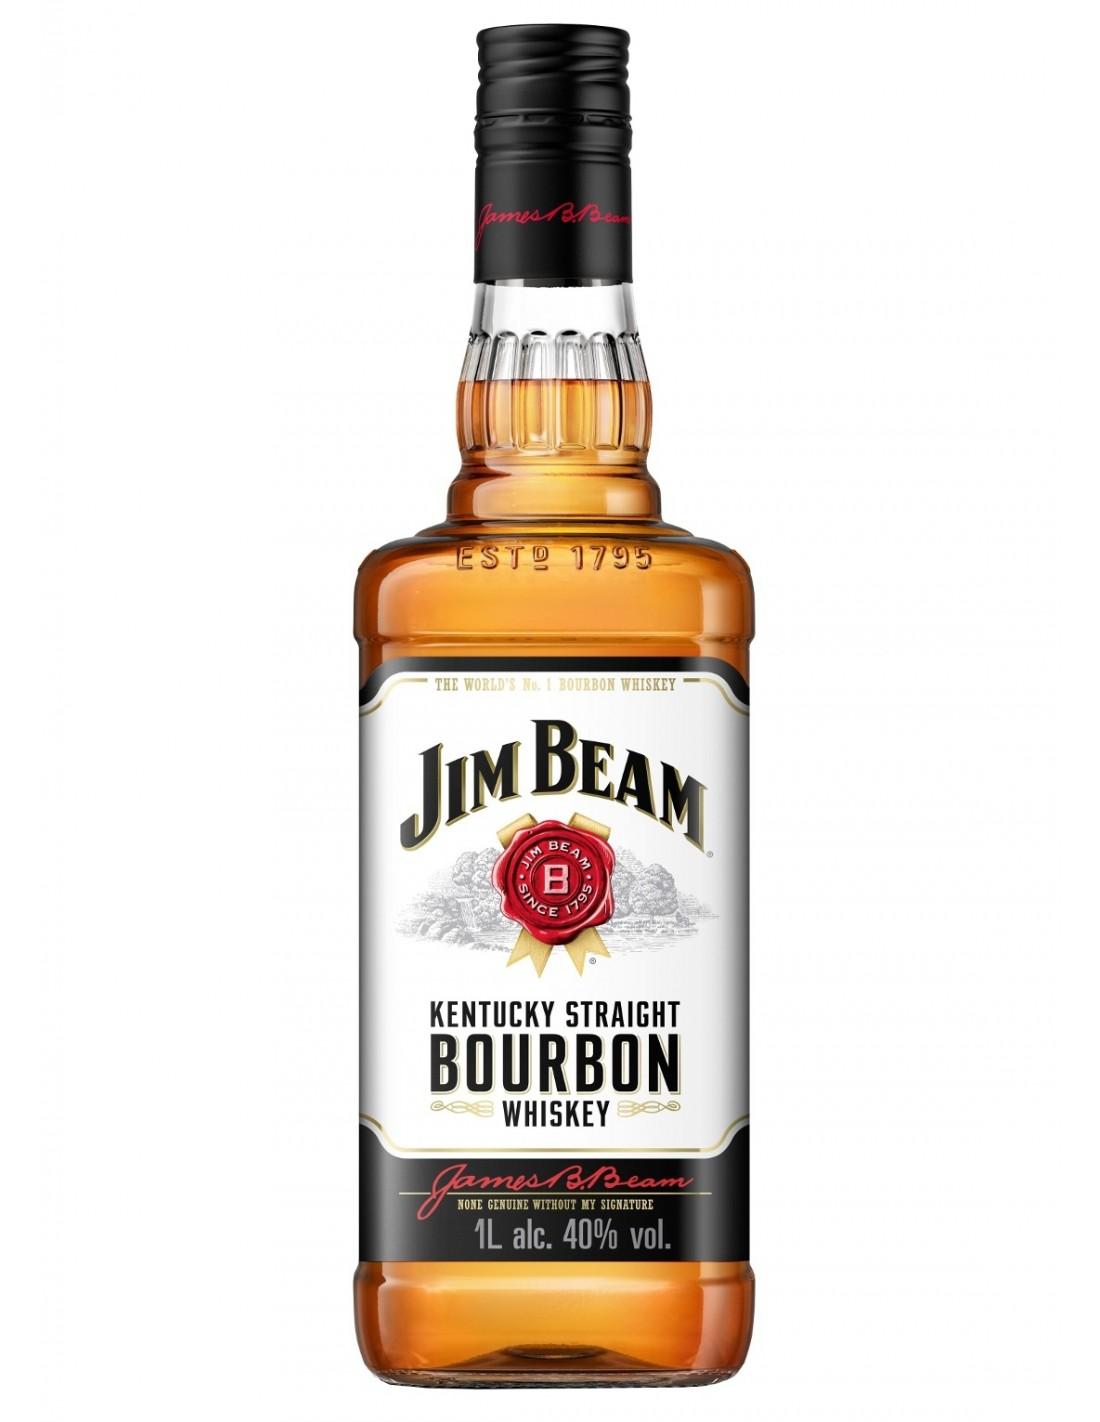 Whisky Bourbon Jim Beam, 40% alc., 1L, America